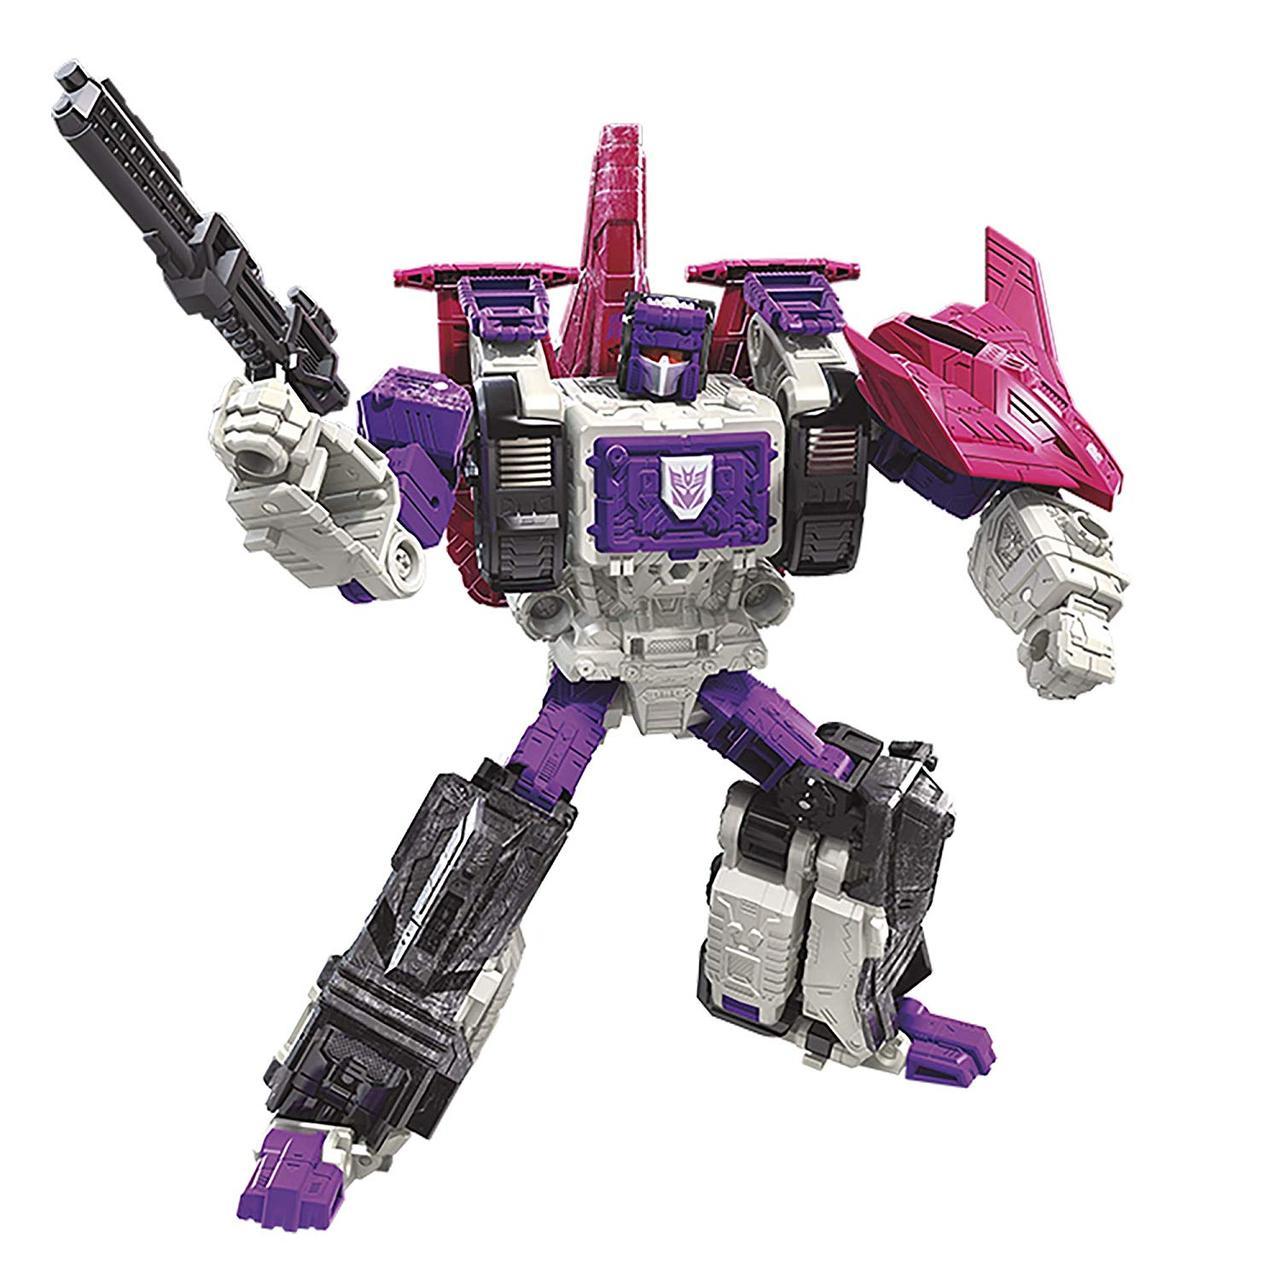 Transformers Трансформер Епфейс потрійний чейнджер Voyager Class WFC-S50 Apeface Война за Кибертрон Hasbro